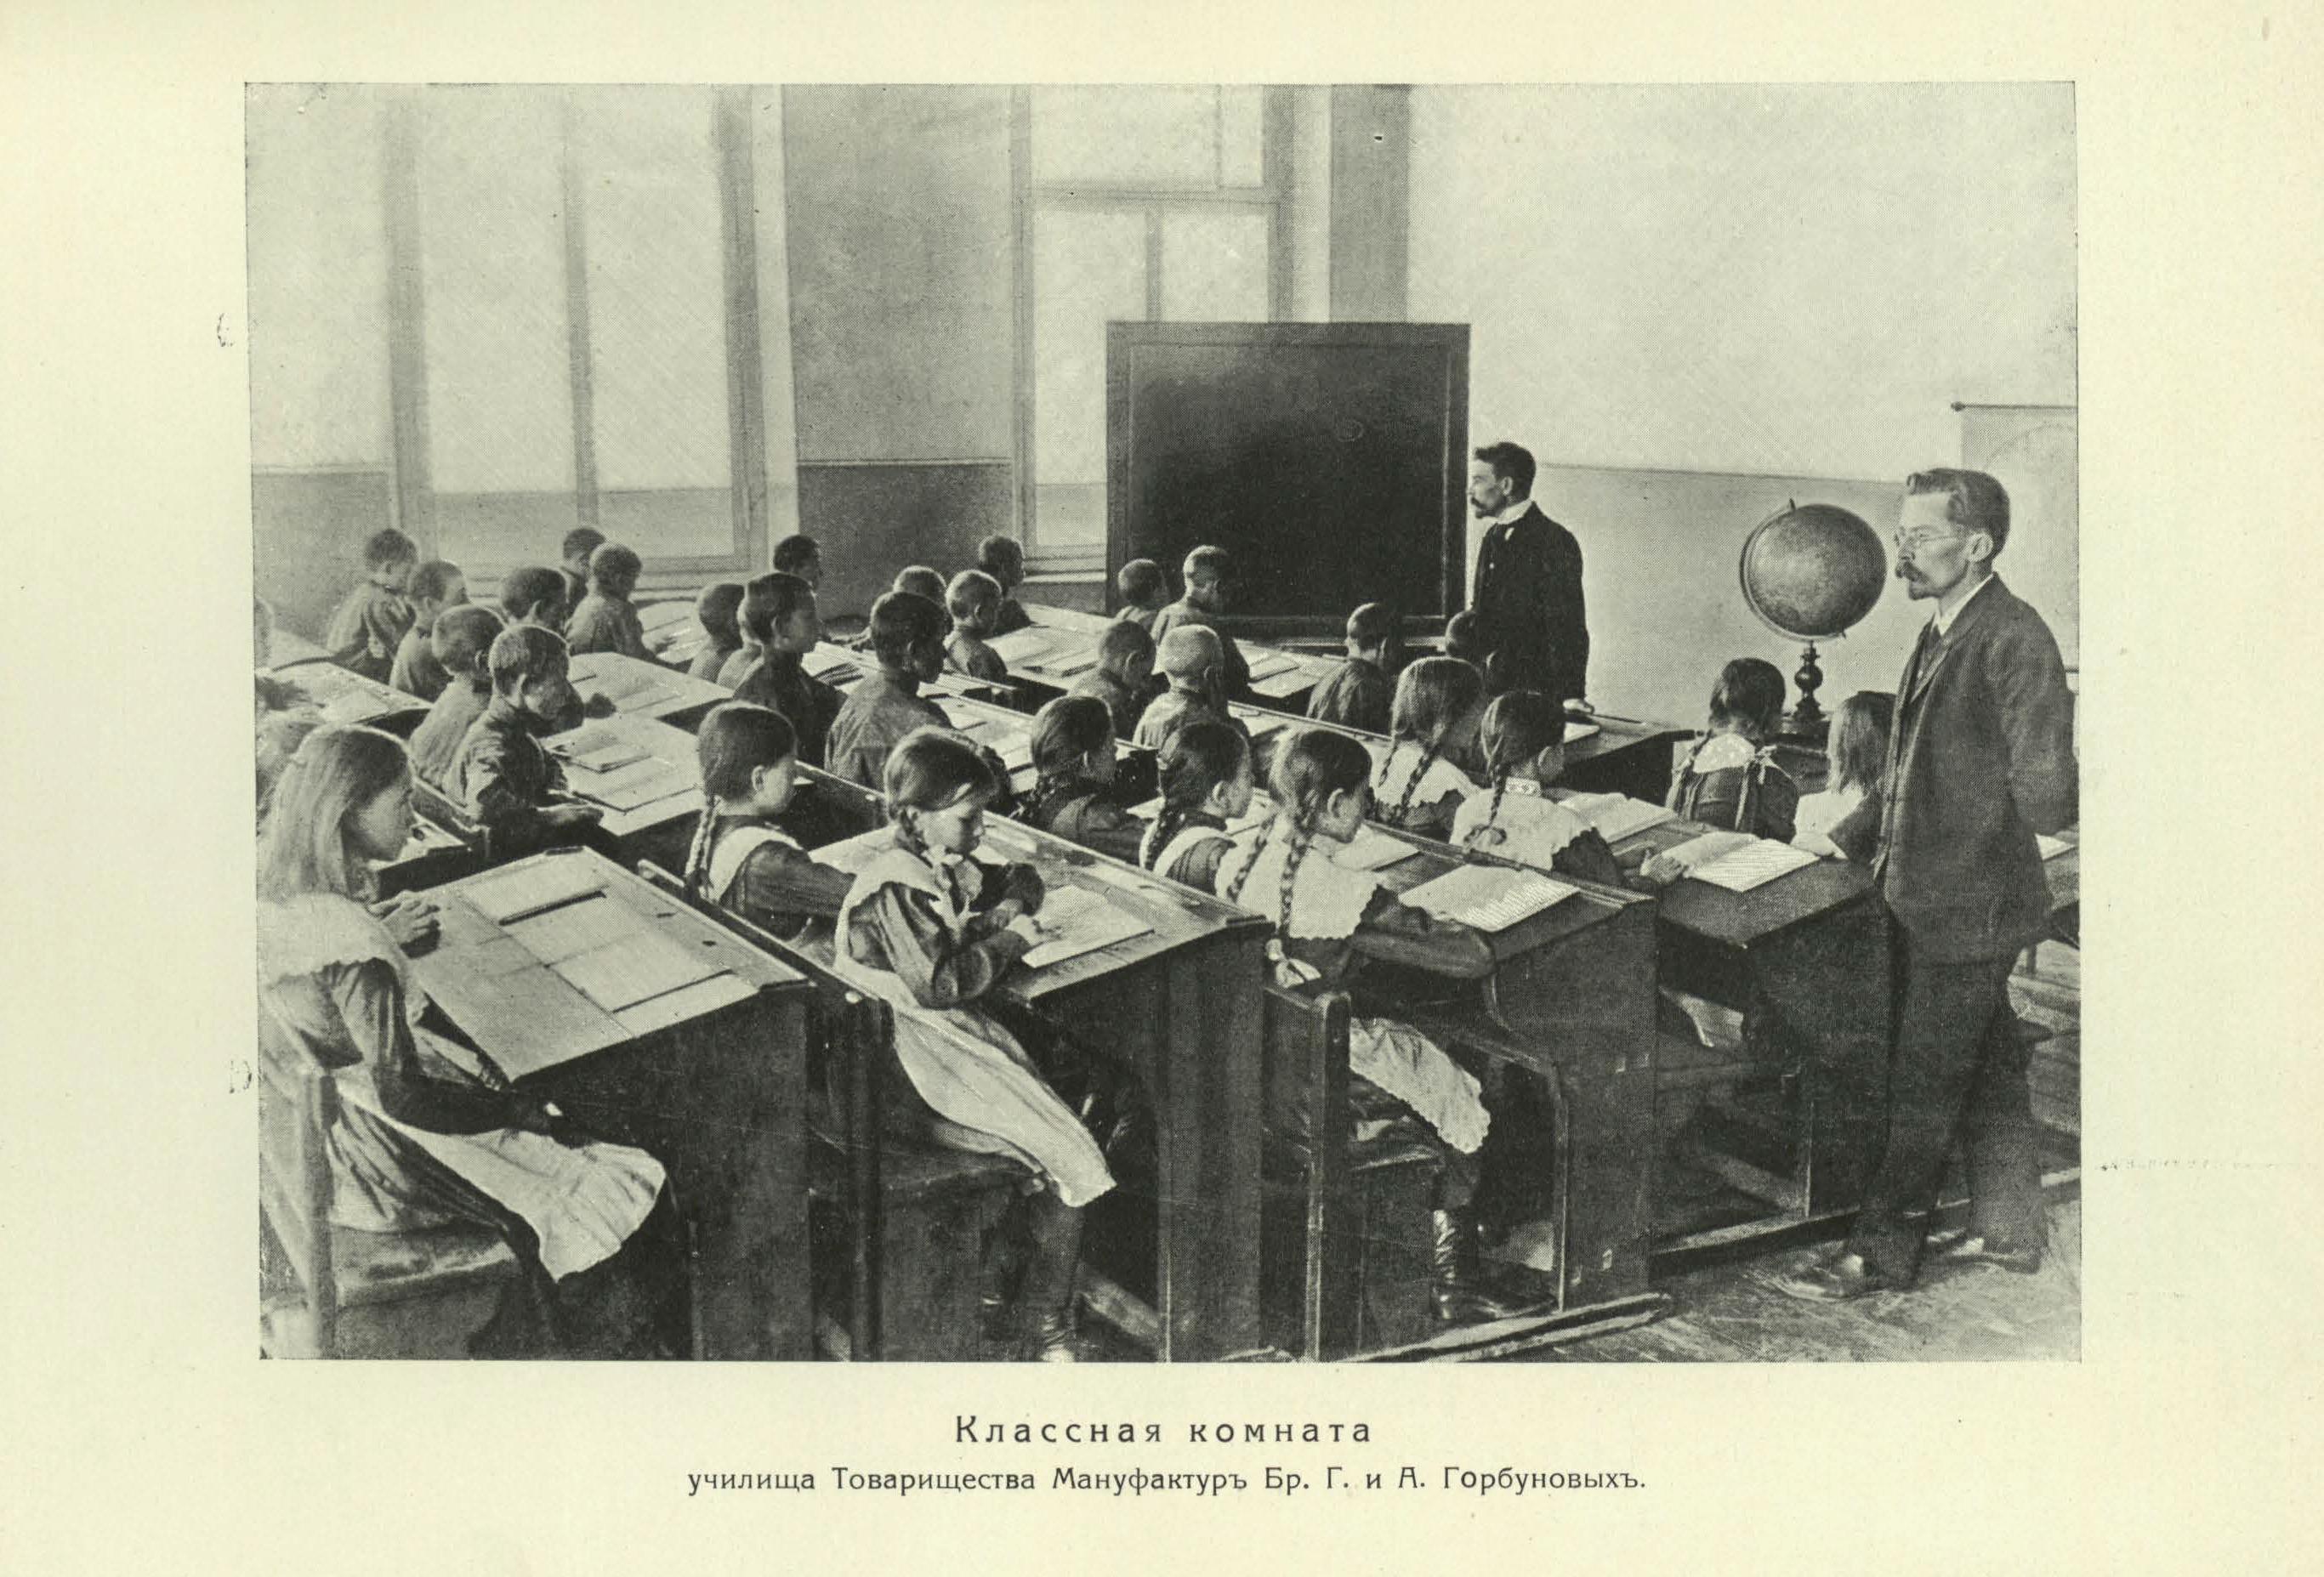 013. Классная комната училища